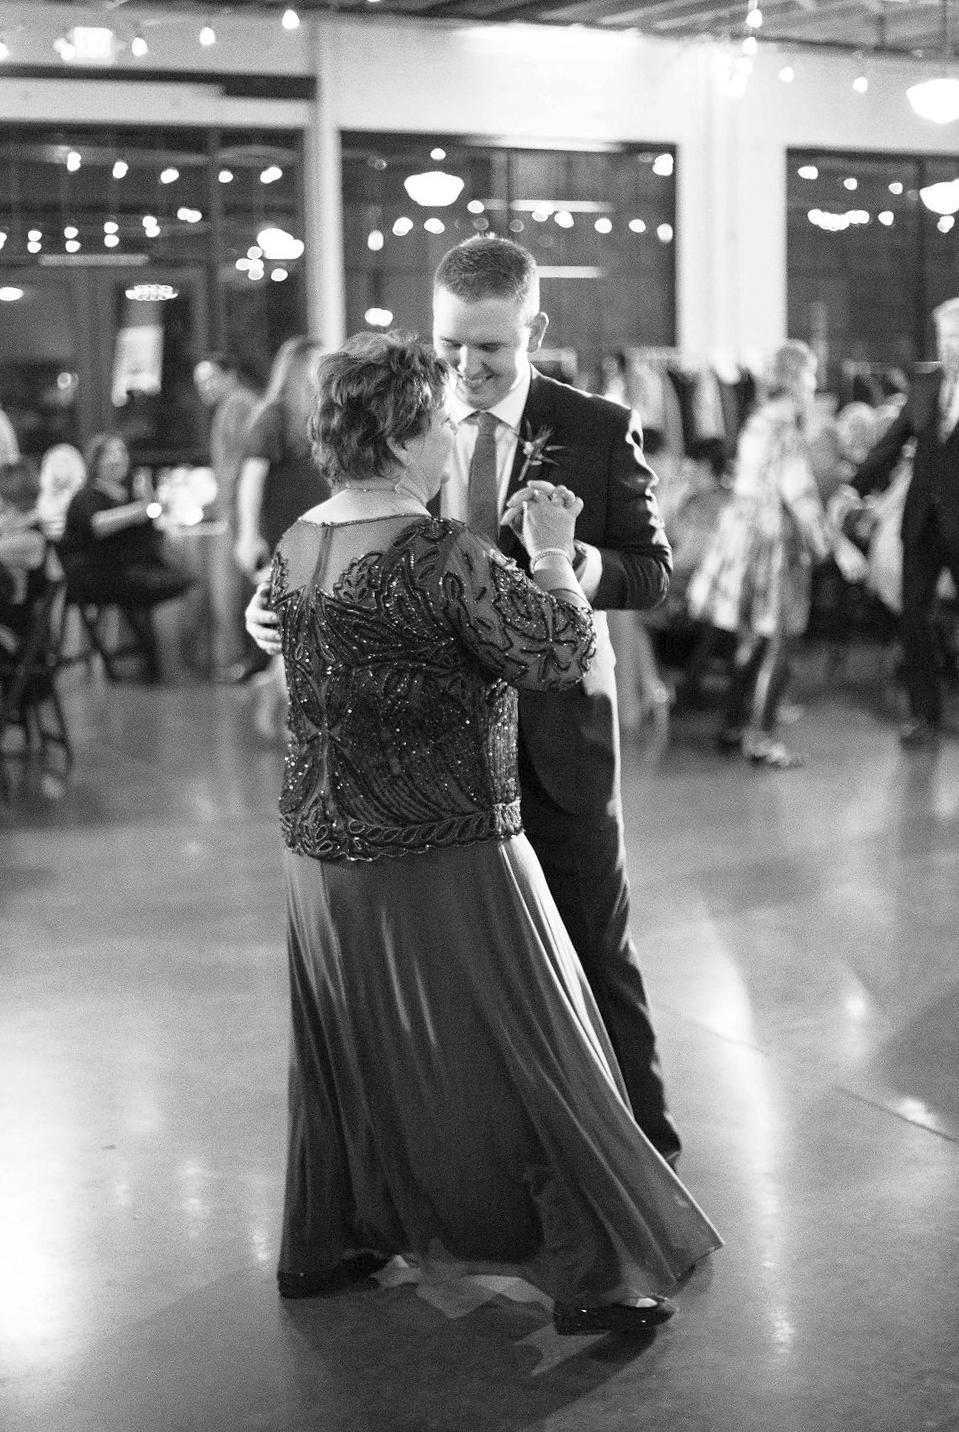 037_reception_portland,oregon,castaway,wedding,by_outlive_creative,photo,and,video.jpg